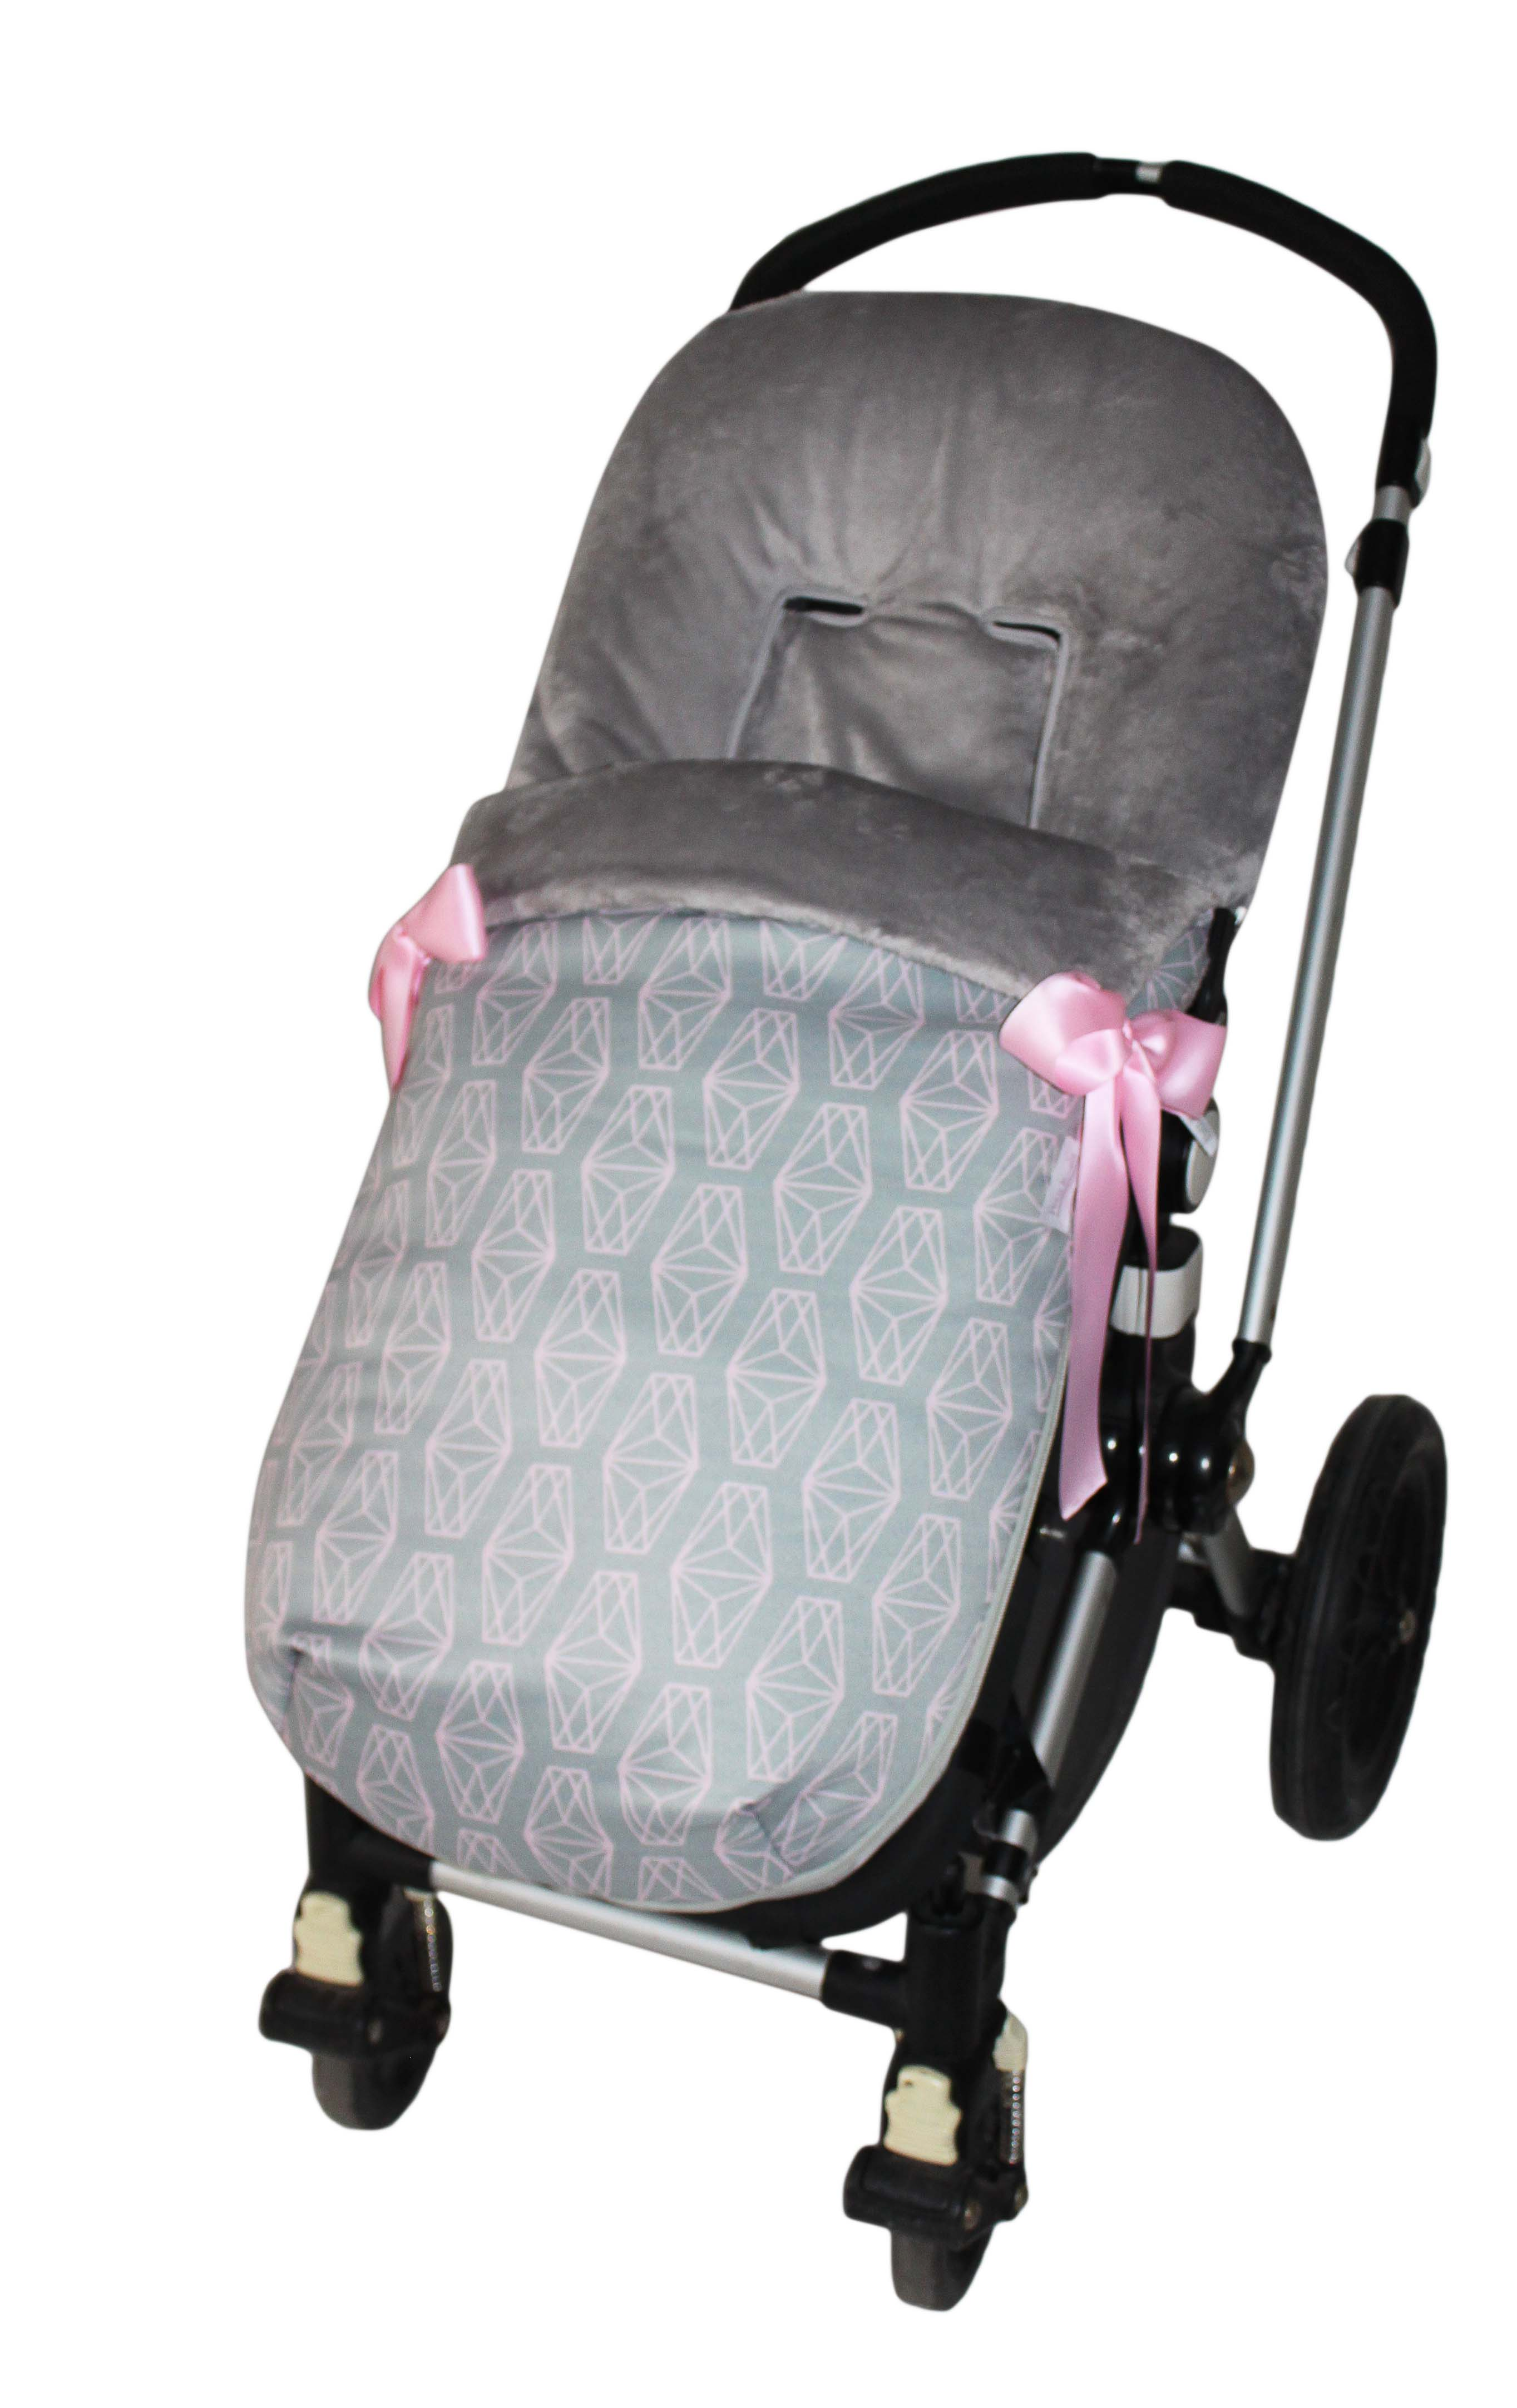 Saco bugaboo invierno diamante rosa pelo gris saco bugaboo invierno diamente r 110 00 - Sacos silla bebe invierno ...